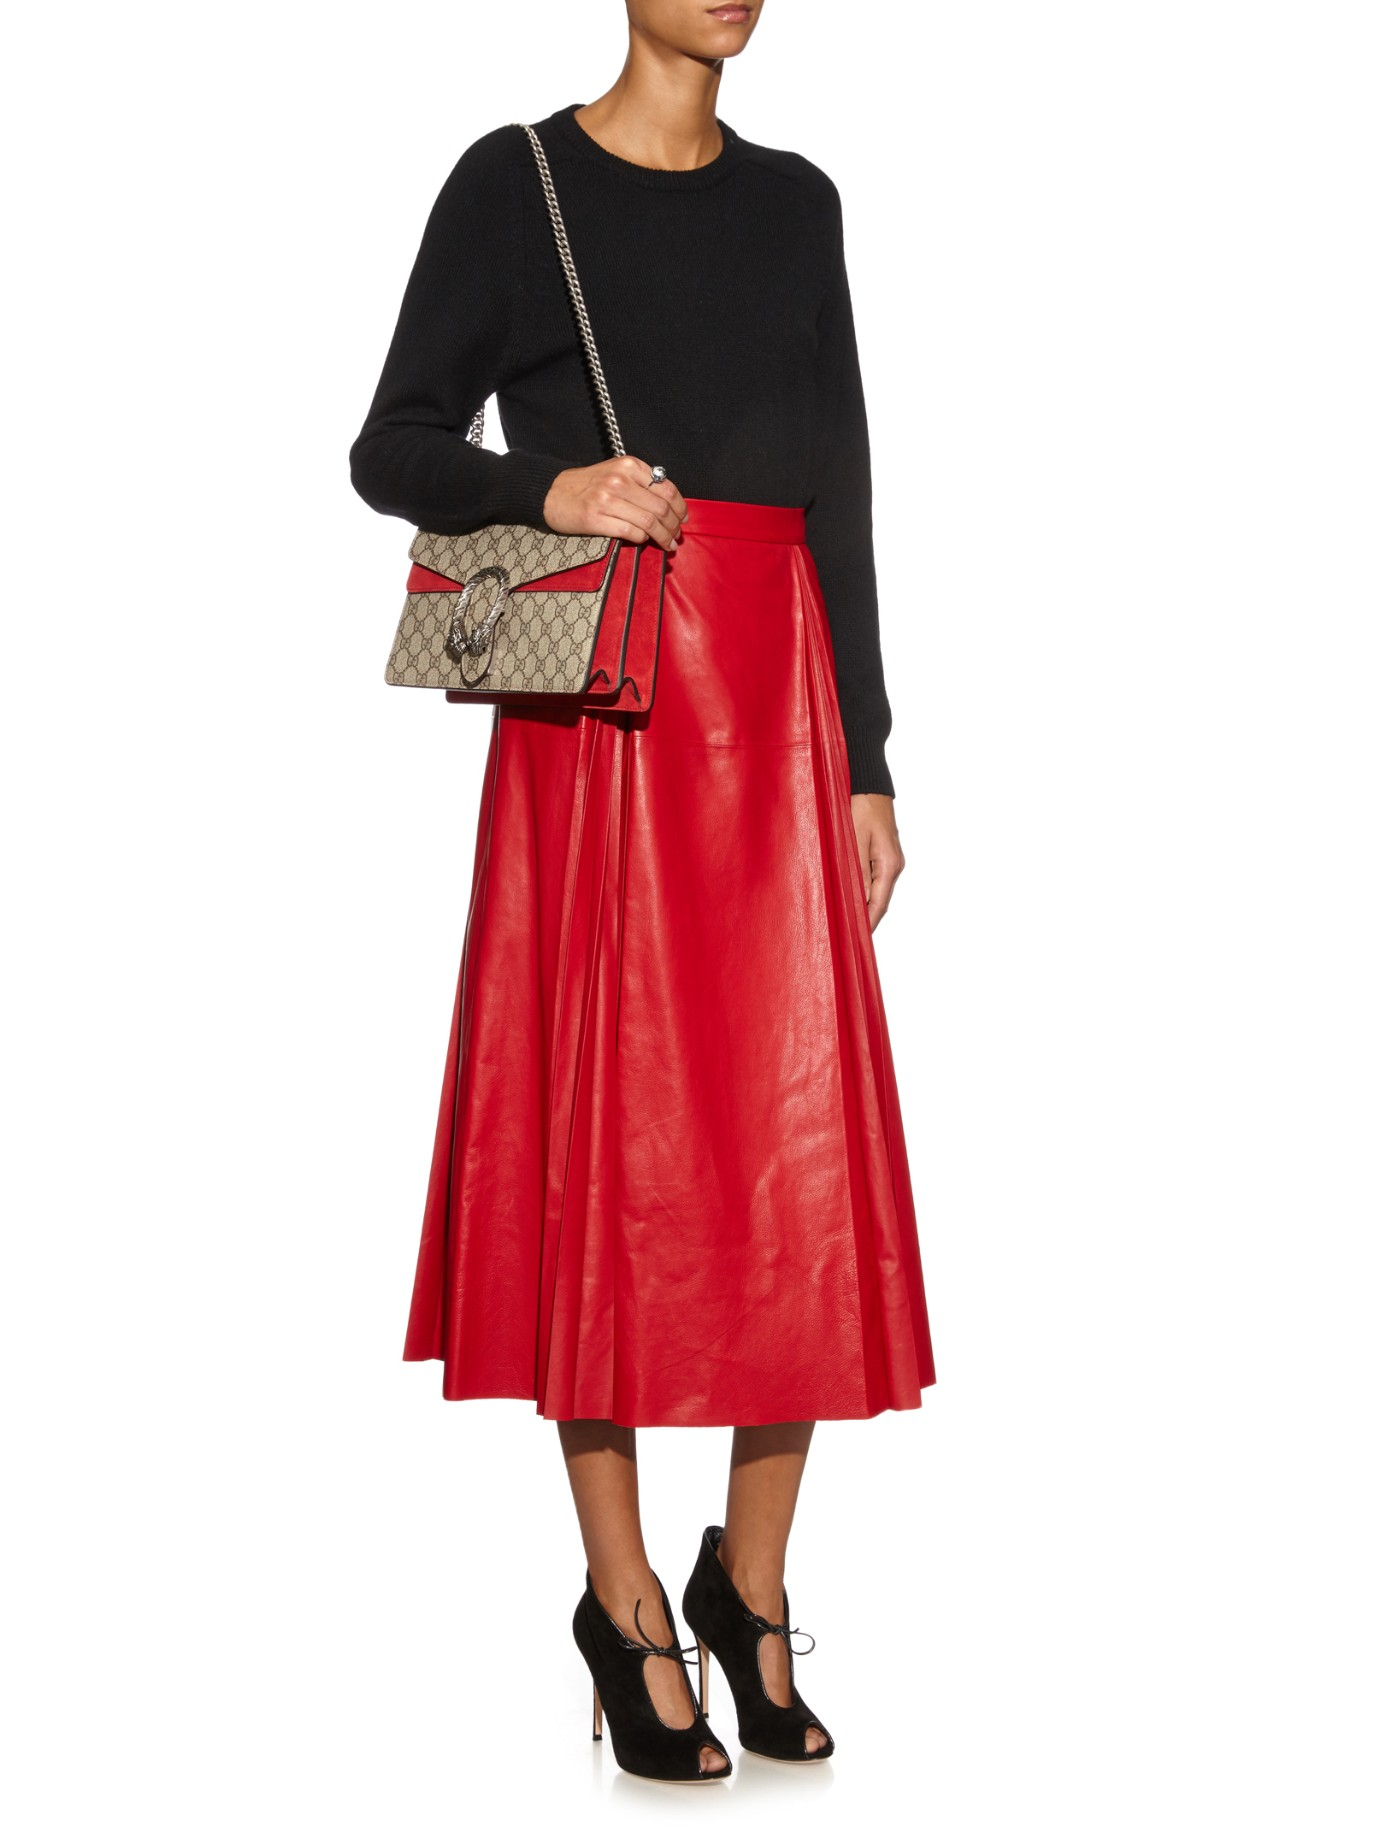 8857f7e5de78 Gucci Dionysus GG Supreme Canvas Shoulder Bag in Gray - Lyst